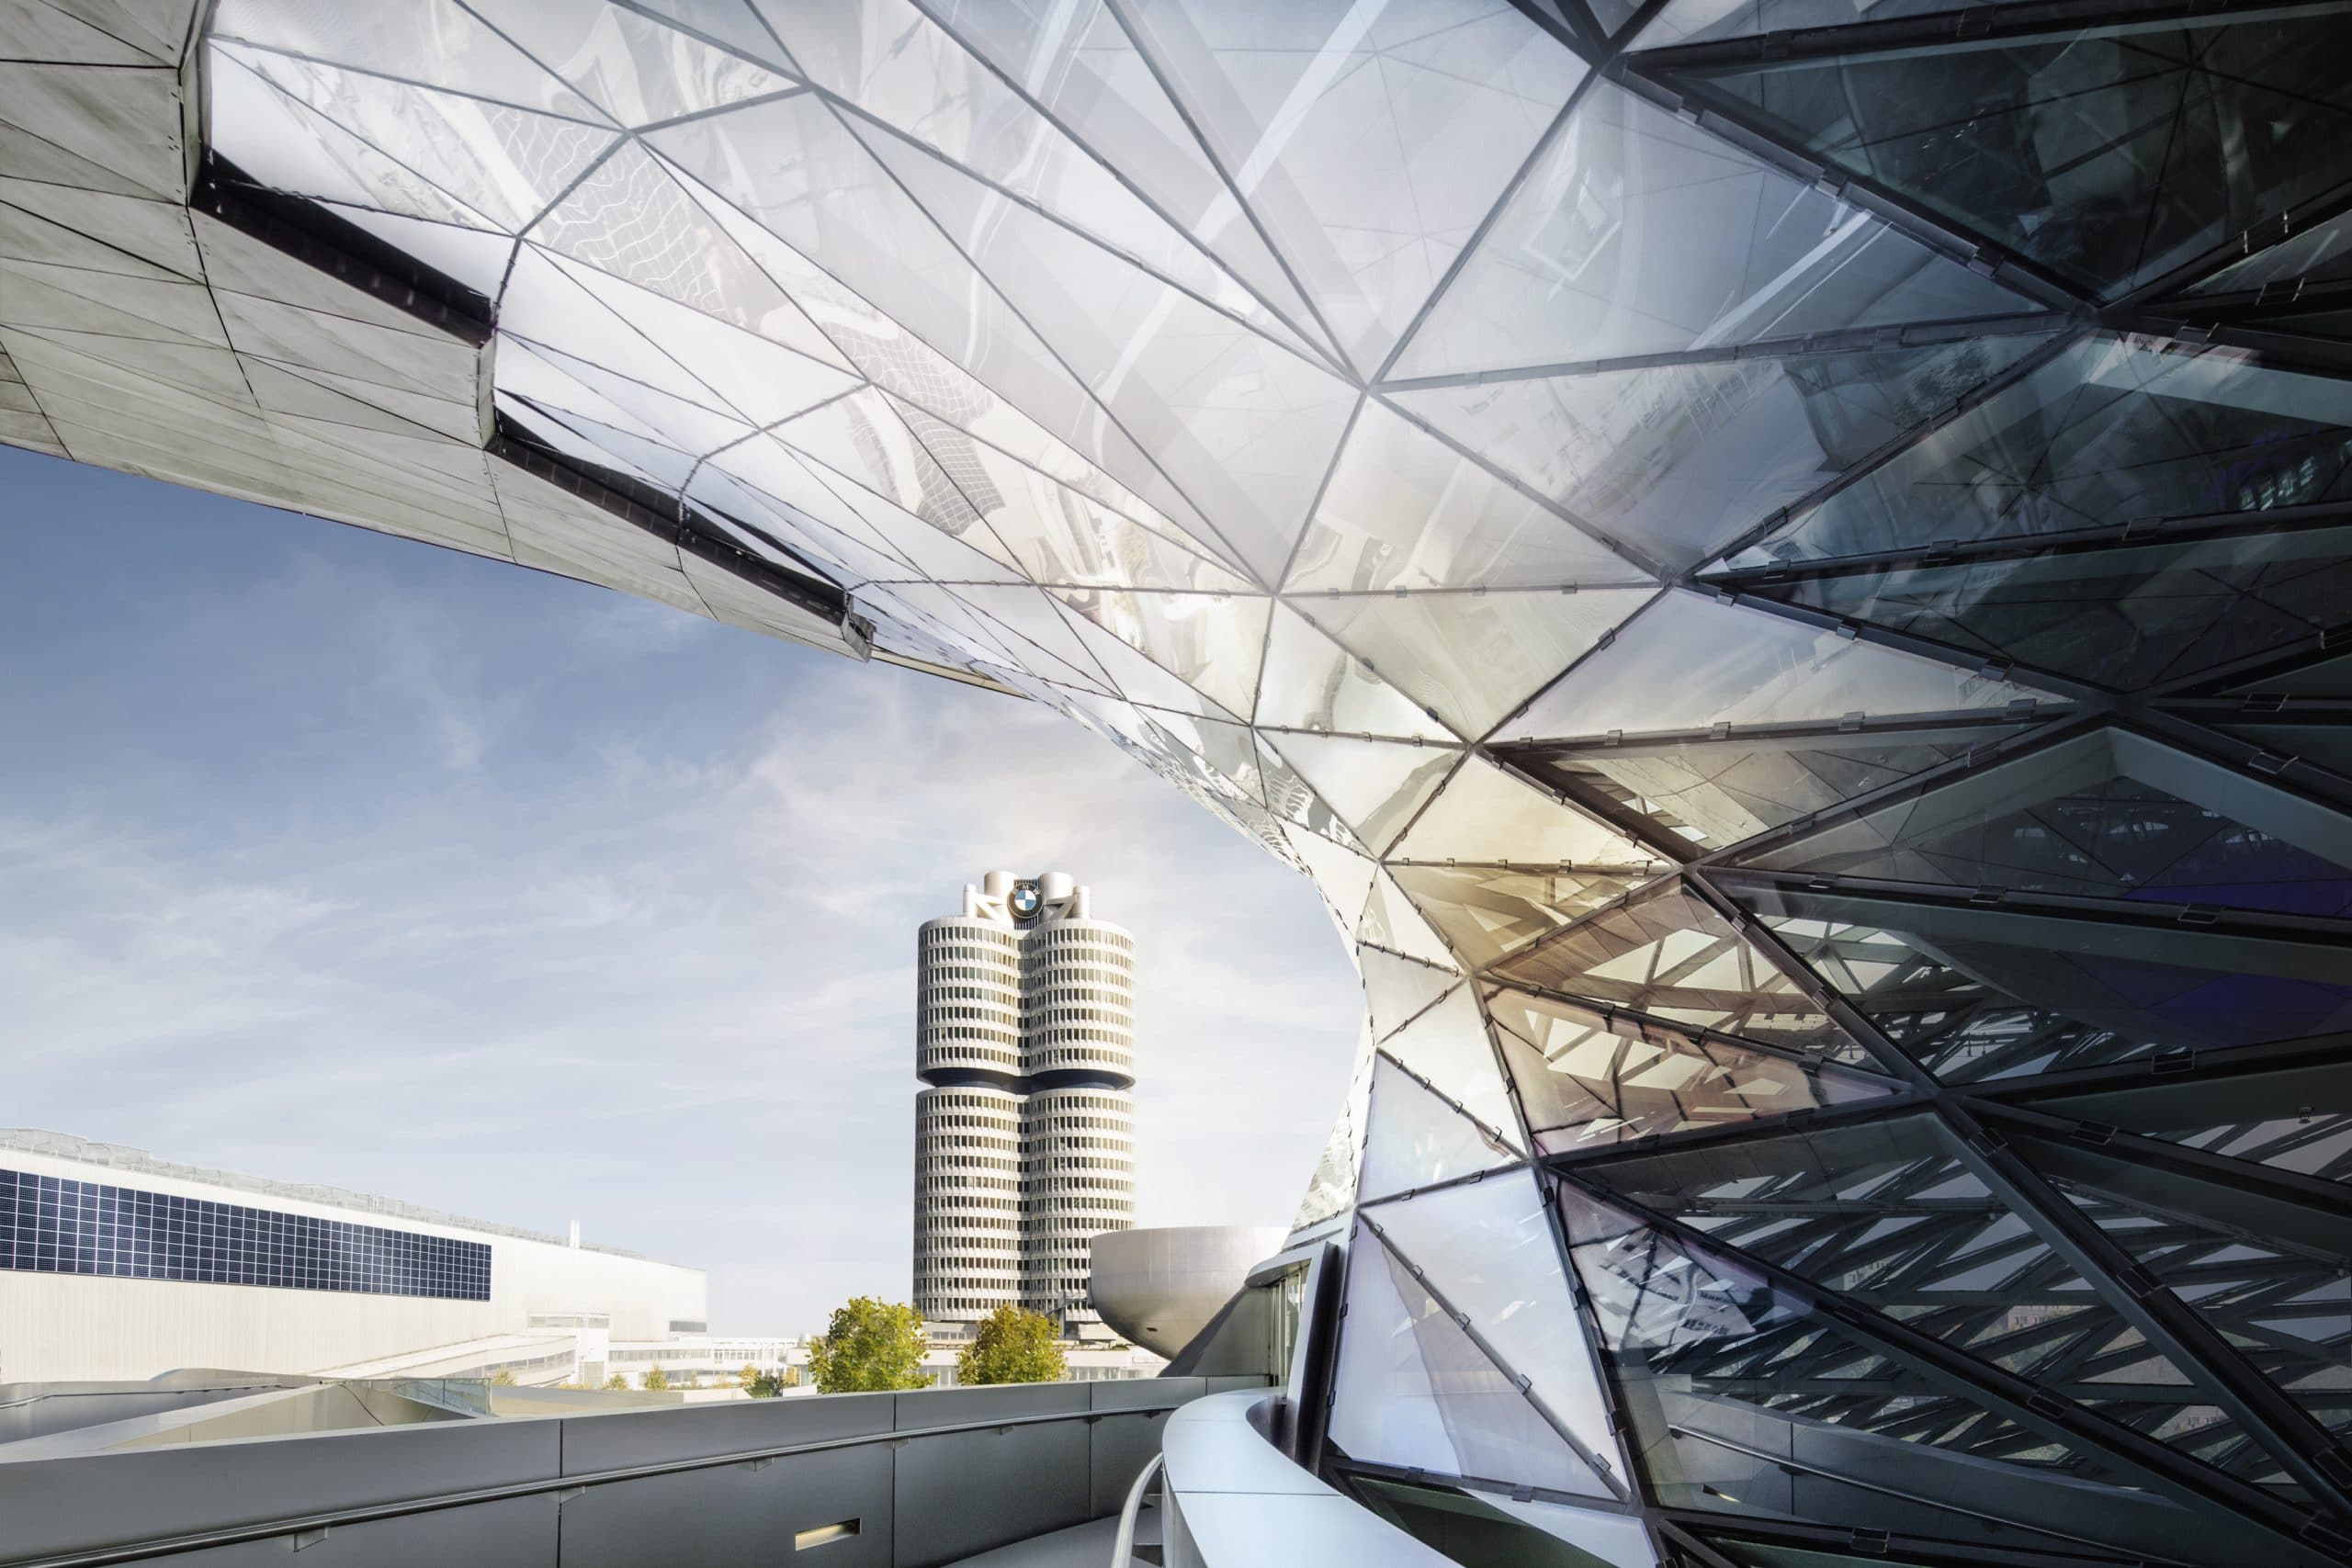 P90211621 highRes scaled Το BMW Group προσφέρει 1,5 εκατ. ευρώ, για να στηρίξει το έργο των υπηρεσιών διάσωσης στη Γερμανία BMW, BMW Group, ειδήσεις, Νέα